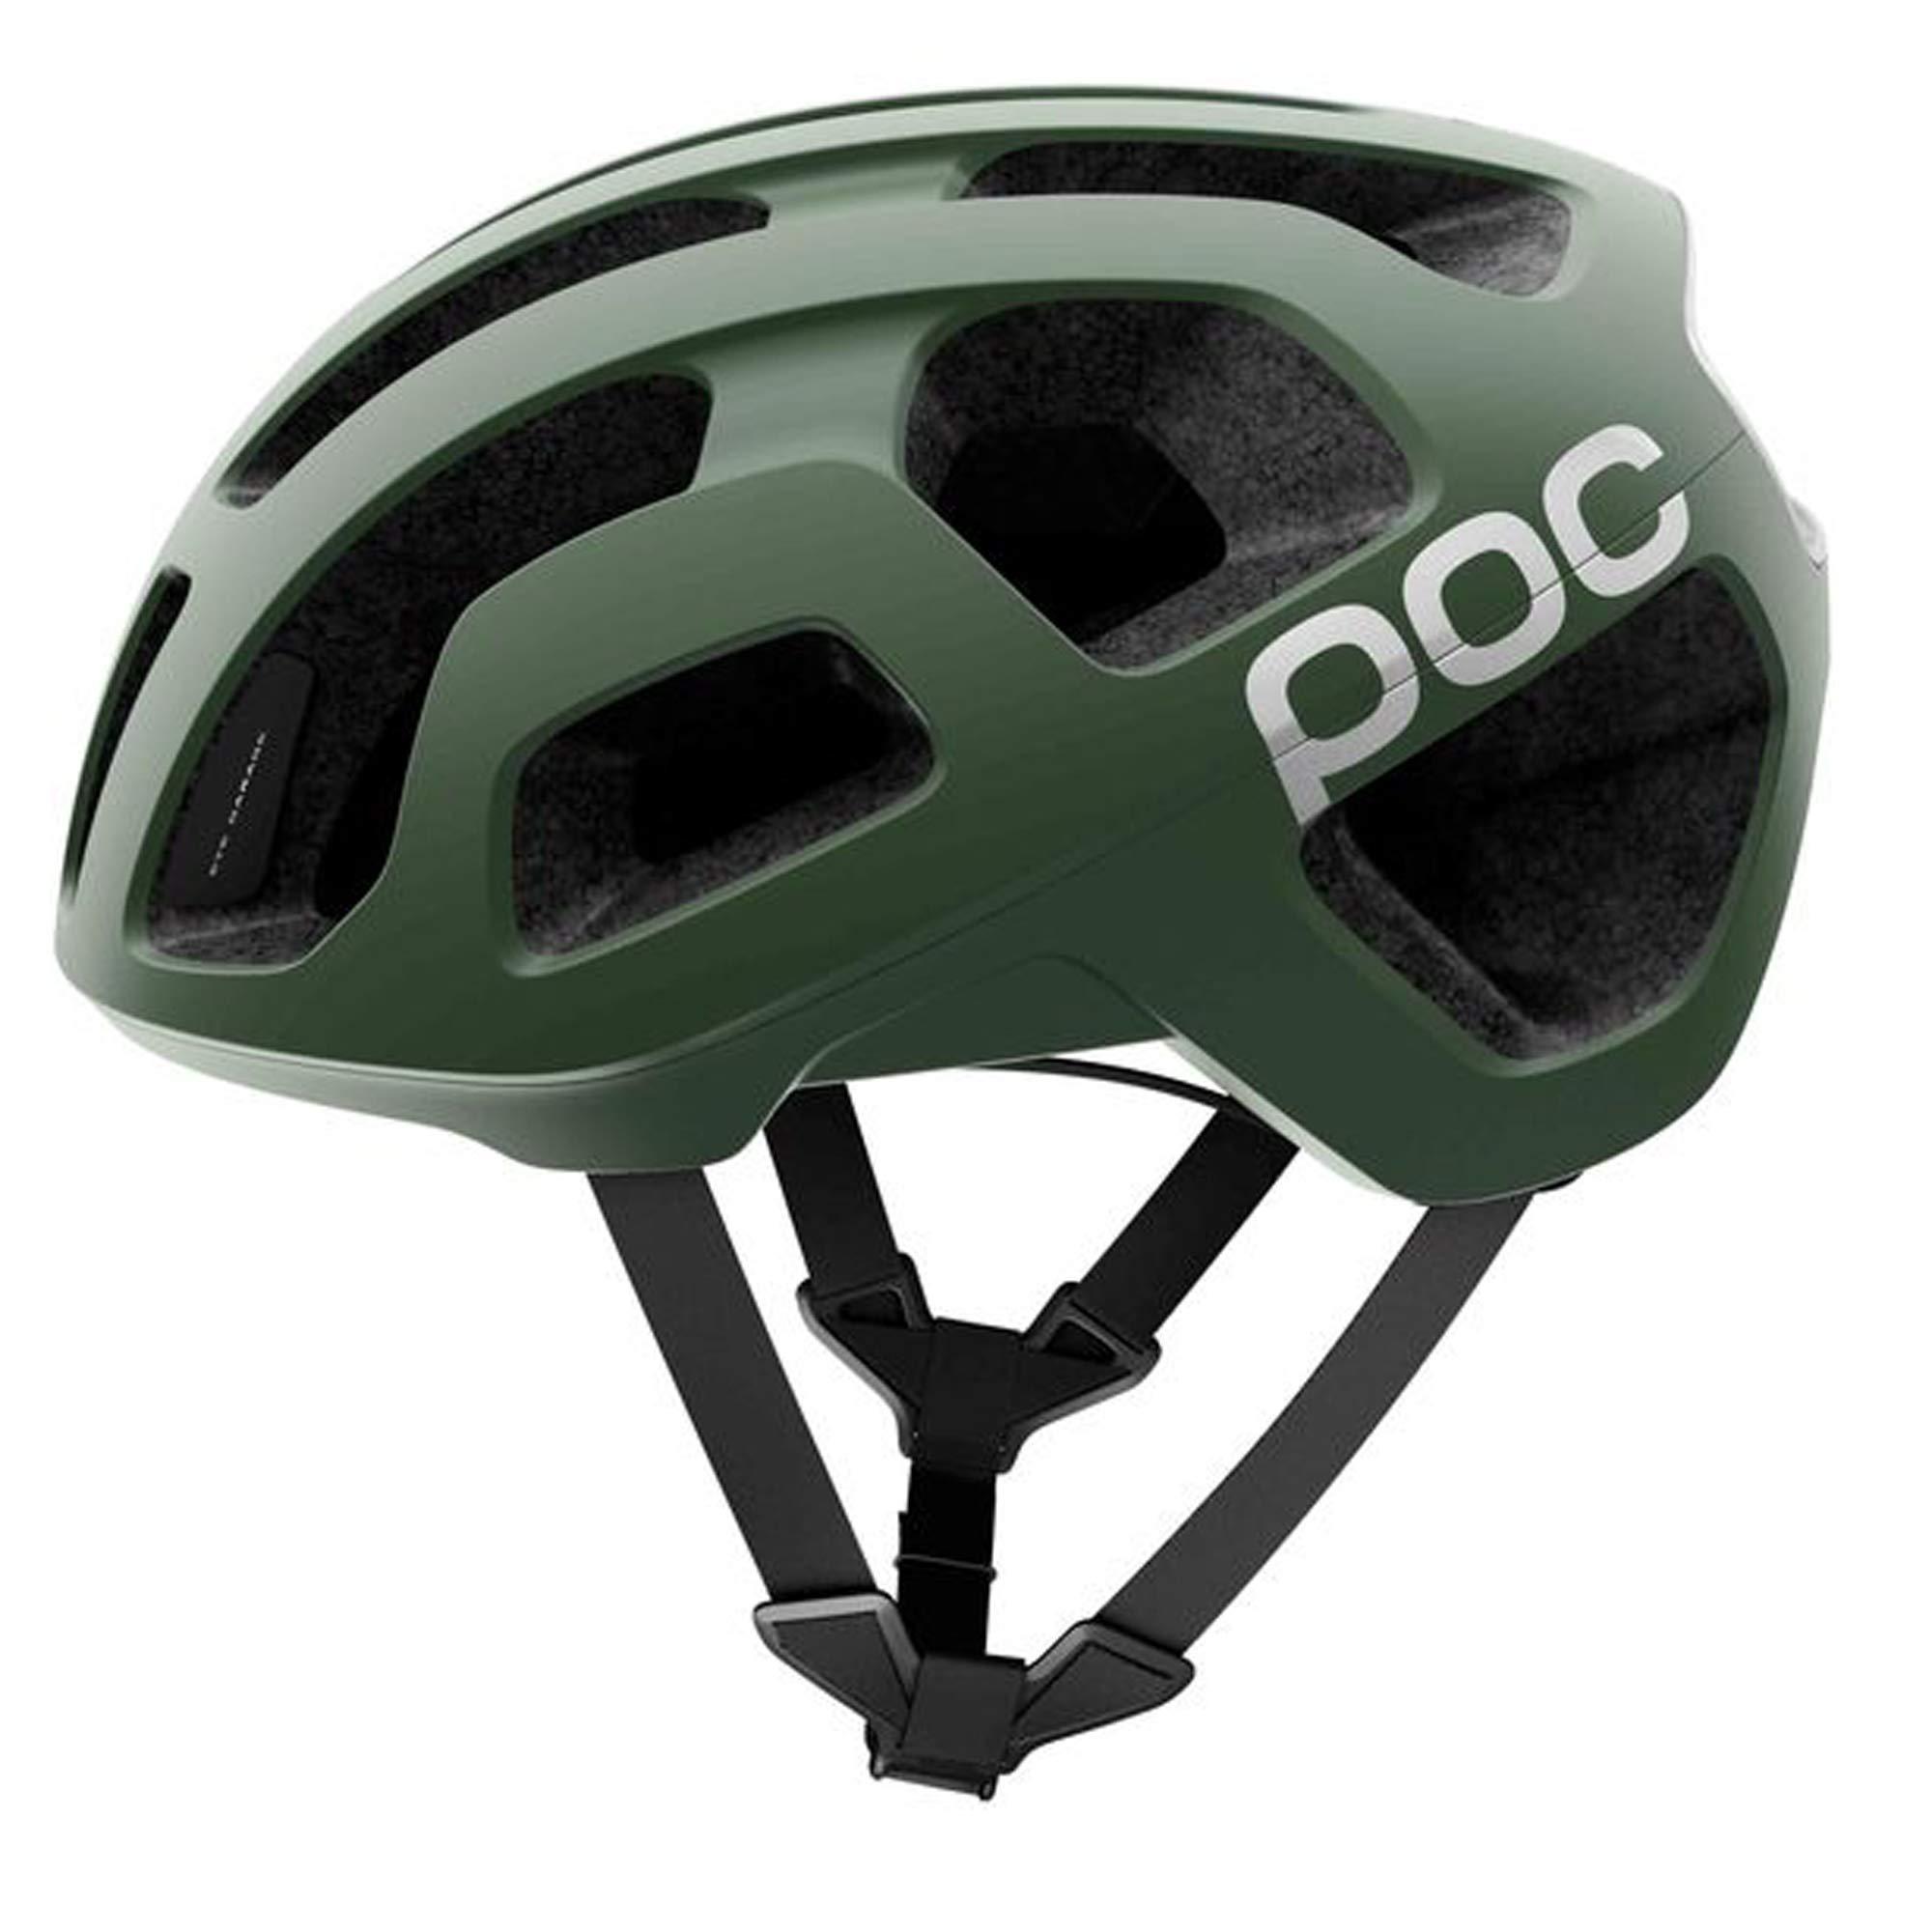 POC Octal, Helmet for Road Biking, Hydrogen, Septane Green, S